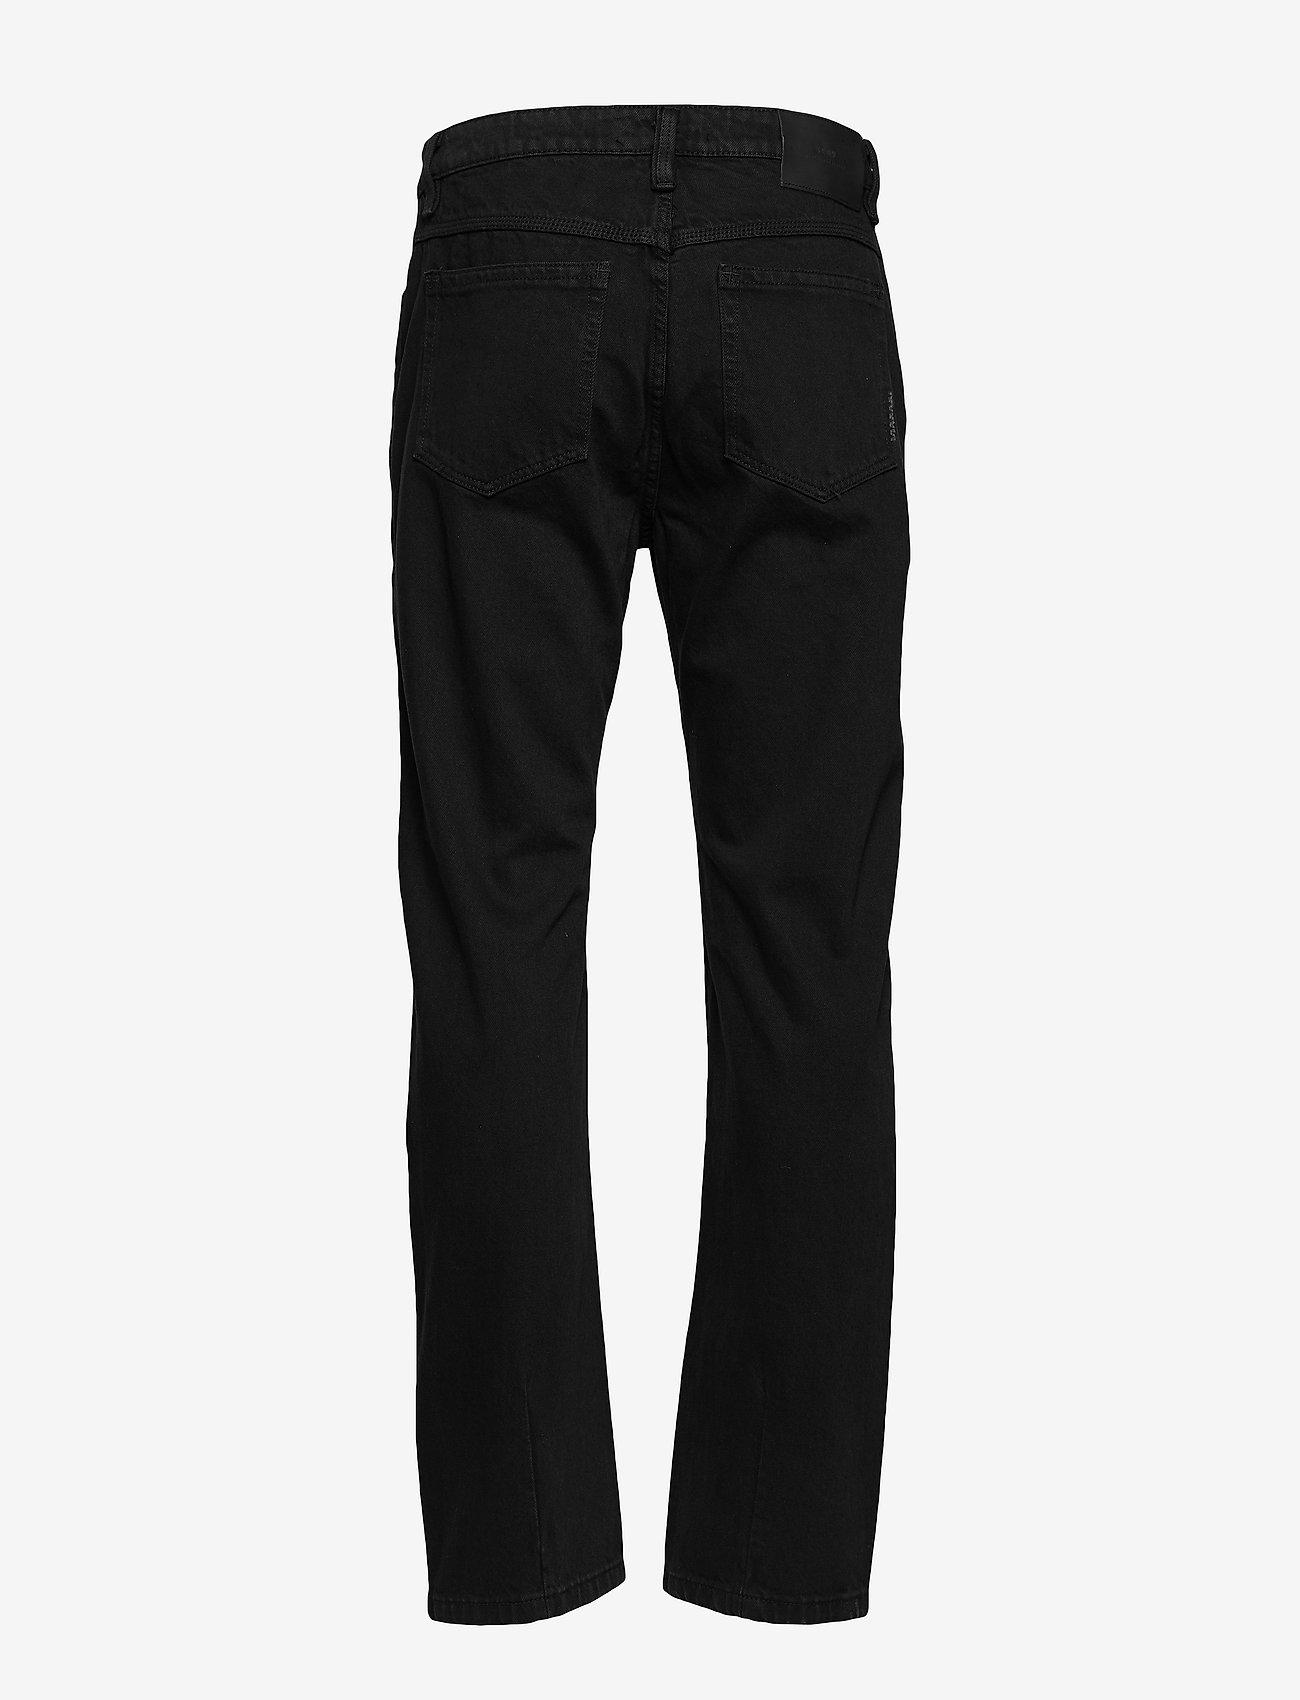 Neuwreid Baggy - Jeans